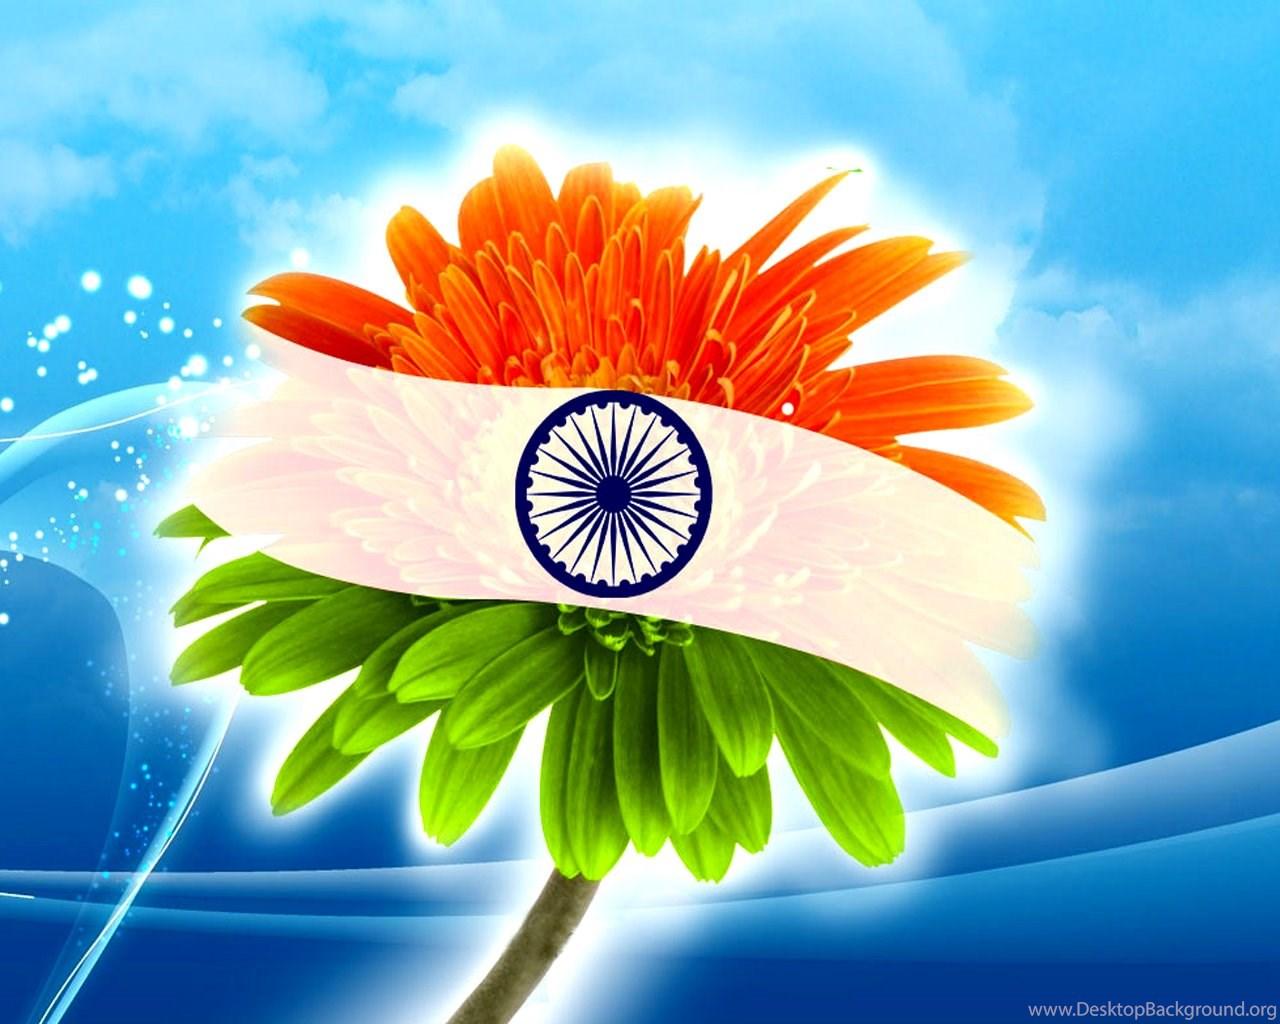 Indian Flag Hd Nature: Indian Flag Hd Wallpapers Desktop Background